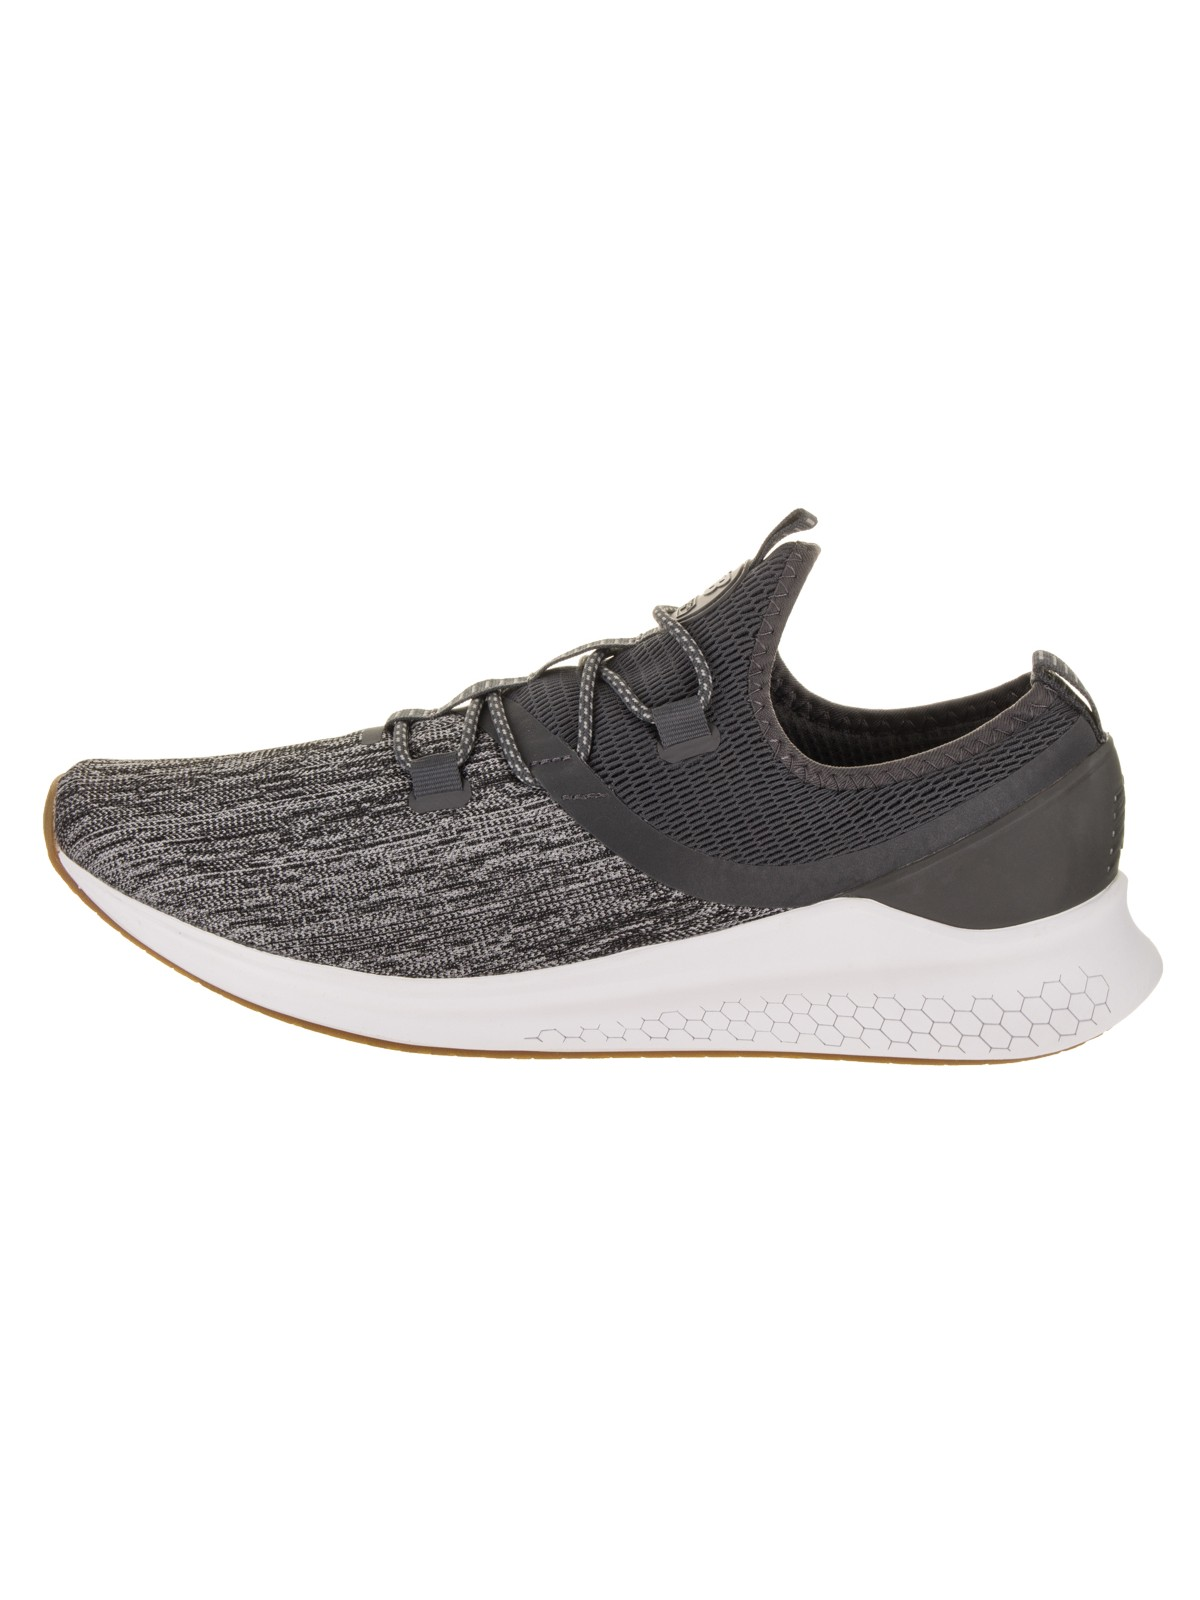 New Balance Men's Fresh Foam Lazr Denim Running Shoe